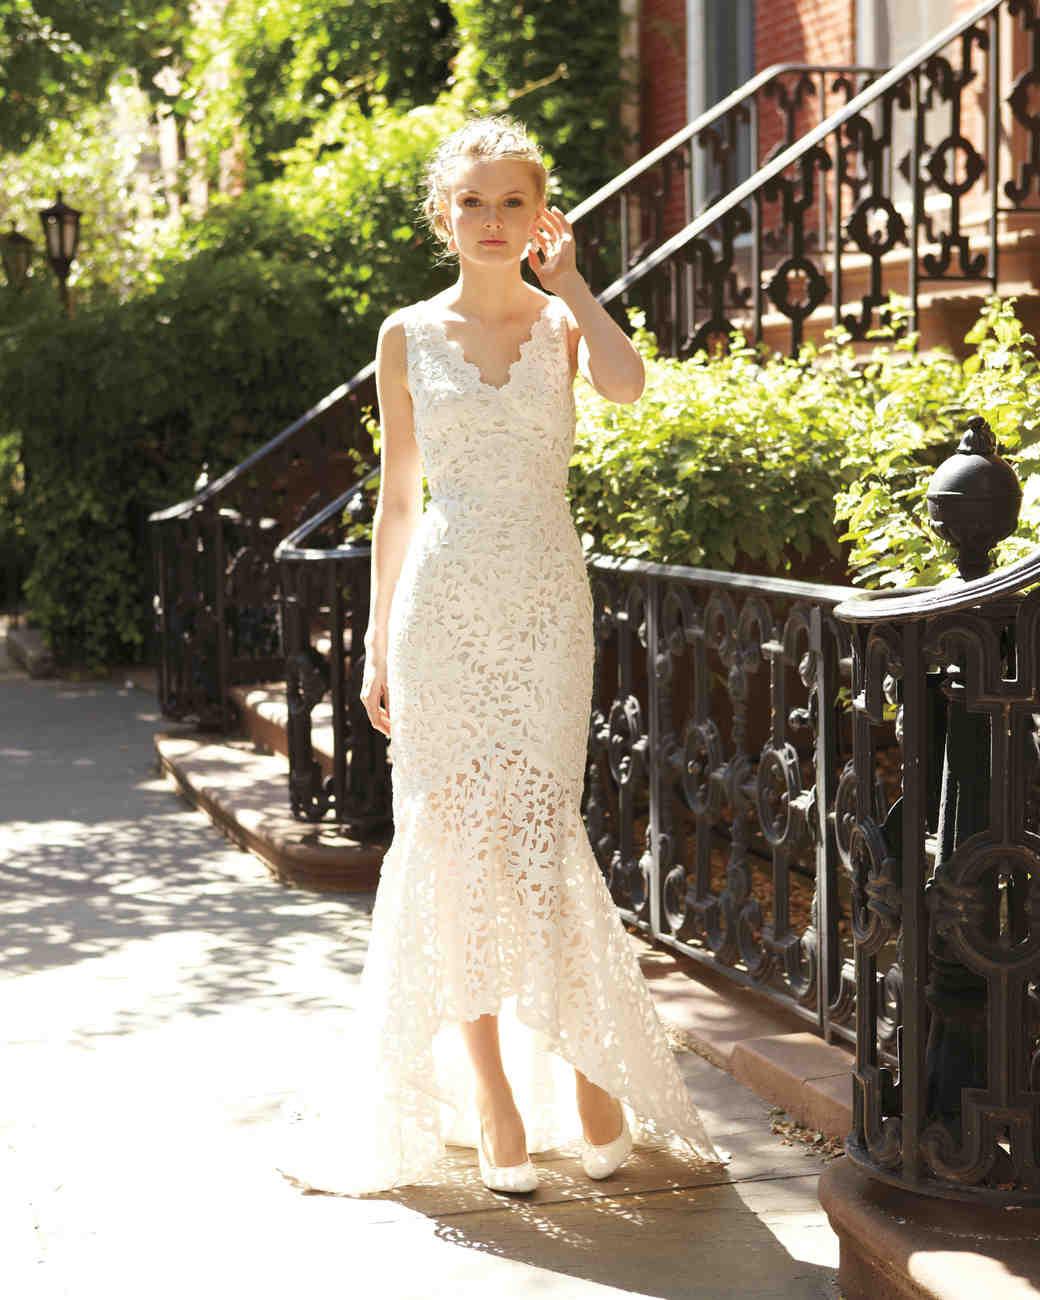 fashion-fillmore-3625-md108970.jpg